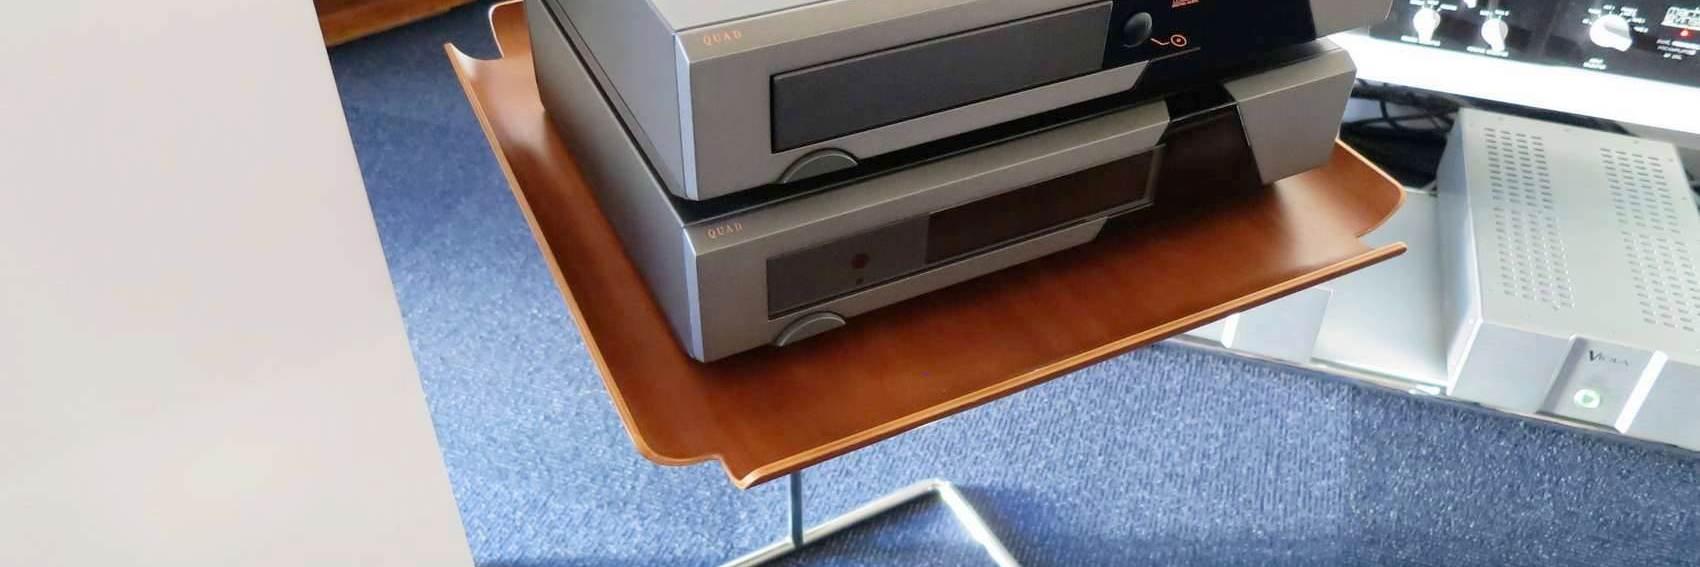 quad66 プリアンプとCD、リモコン